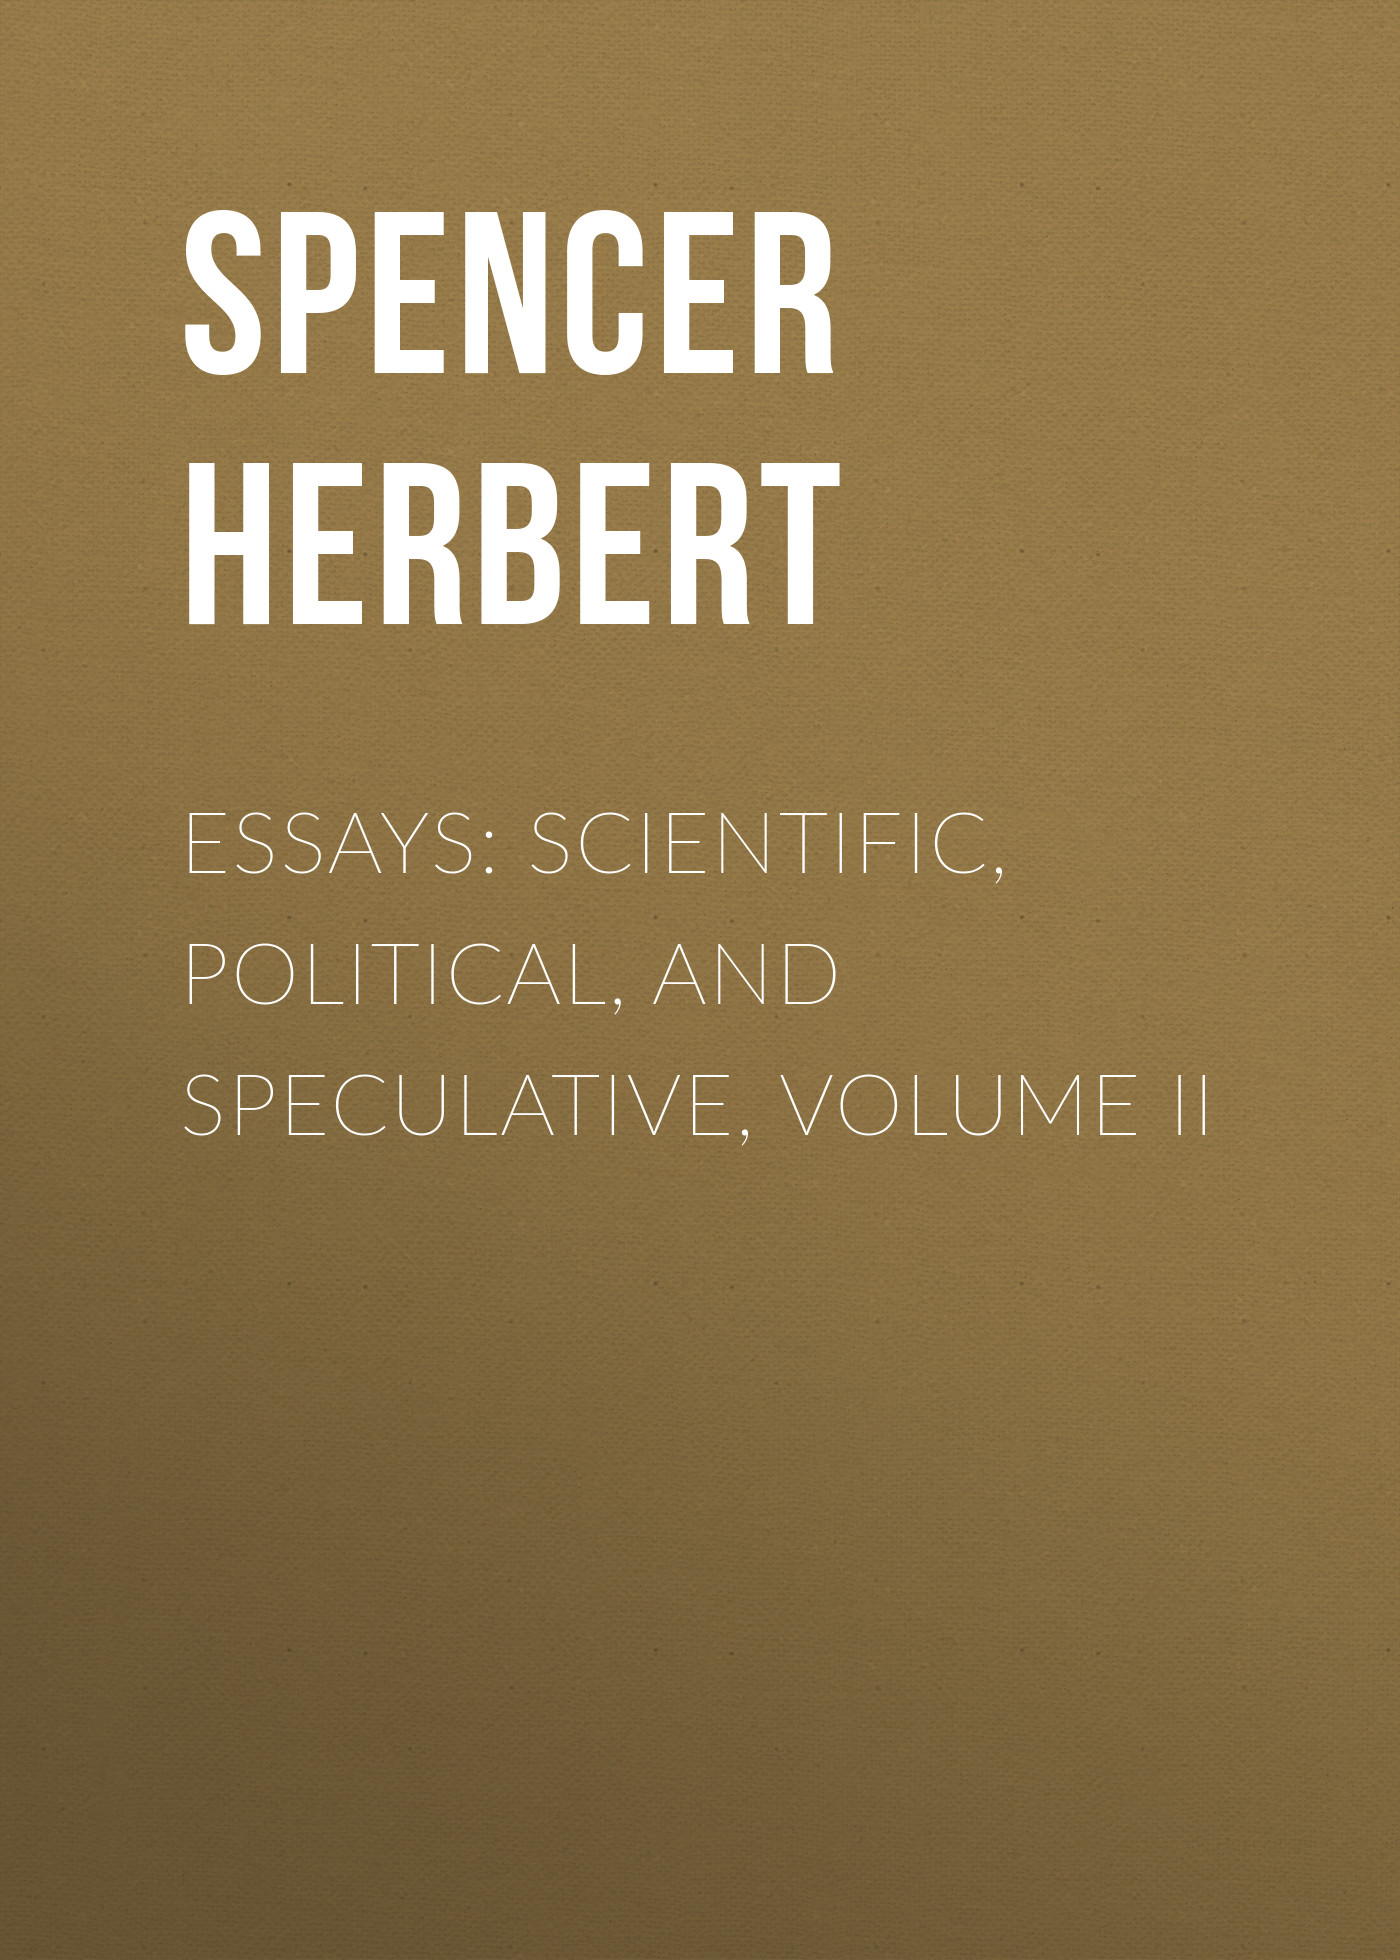 Spencer Herbert Essays: Scientific, Political, and Speculative, Volume II цена и фото